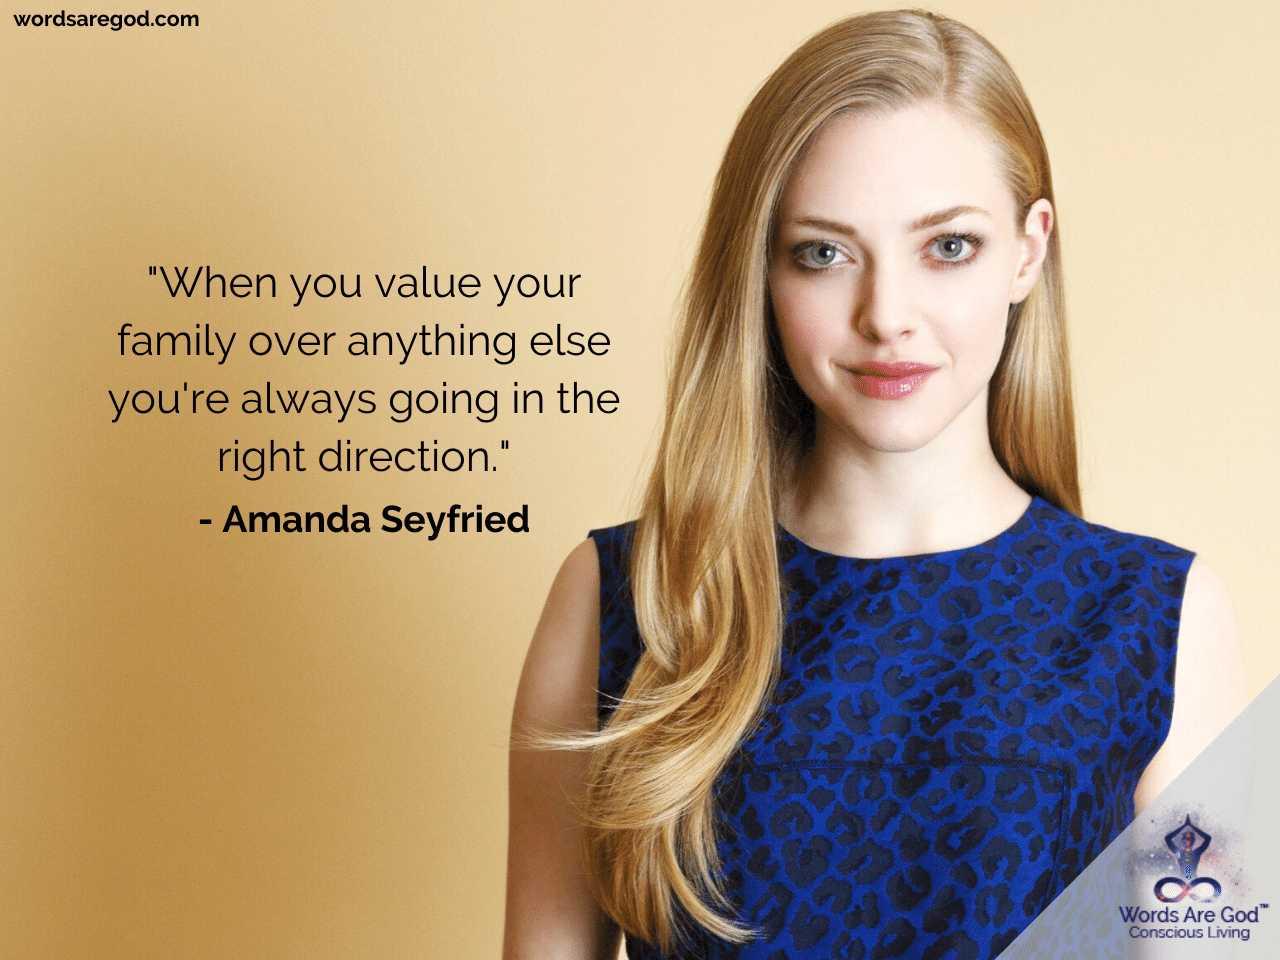 Amanda Seyfried Best Quotes by Amanda Seyfried